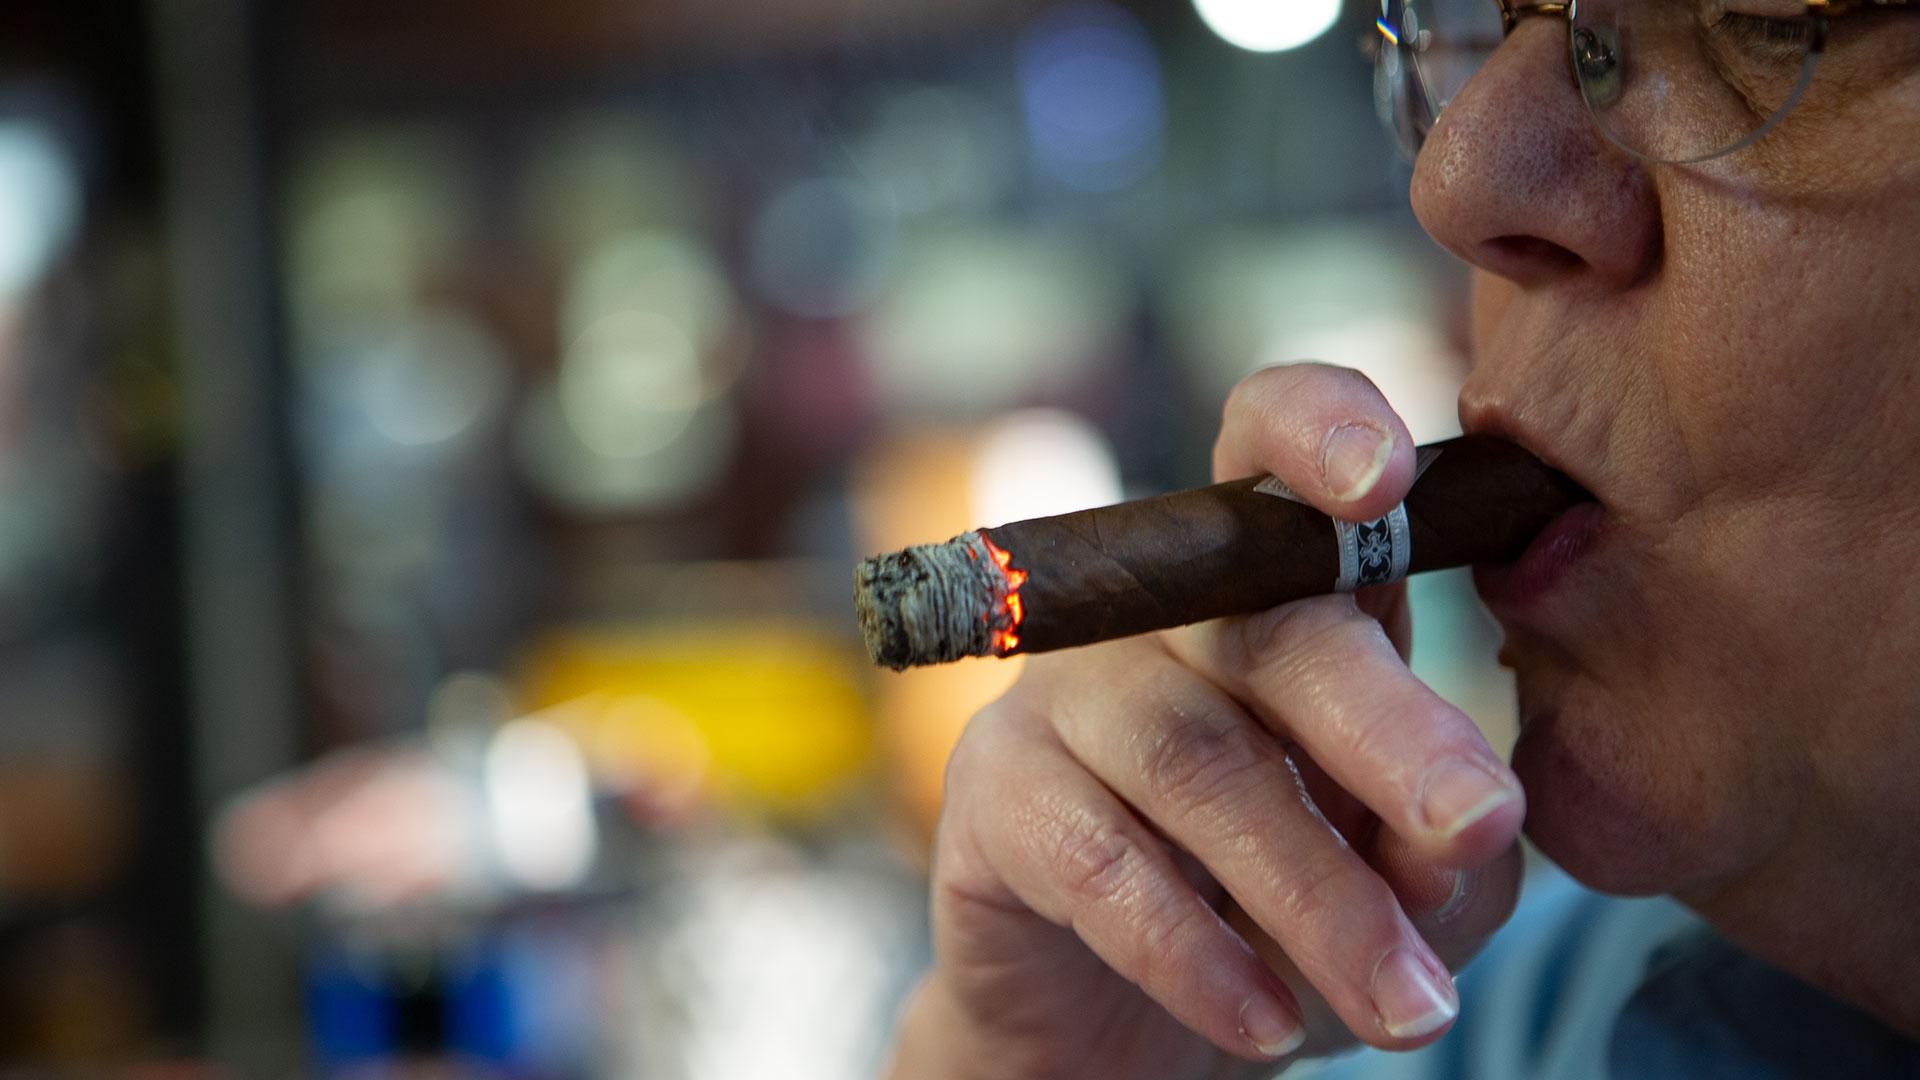 ashing the cigar